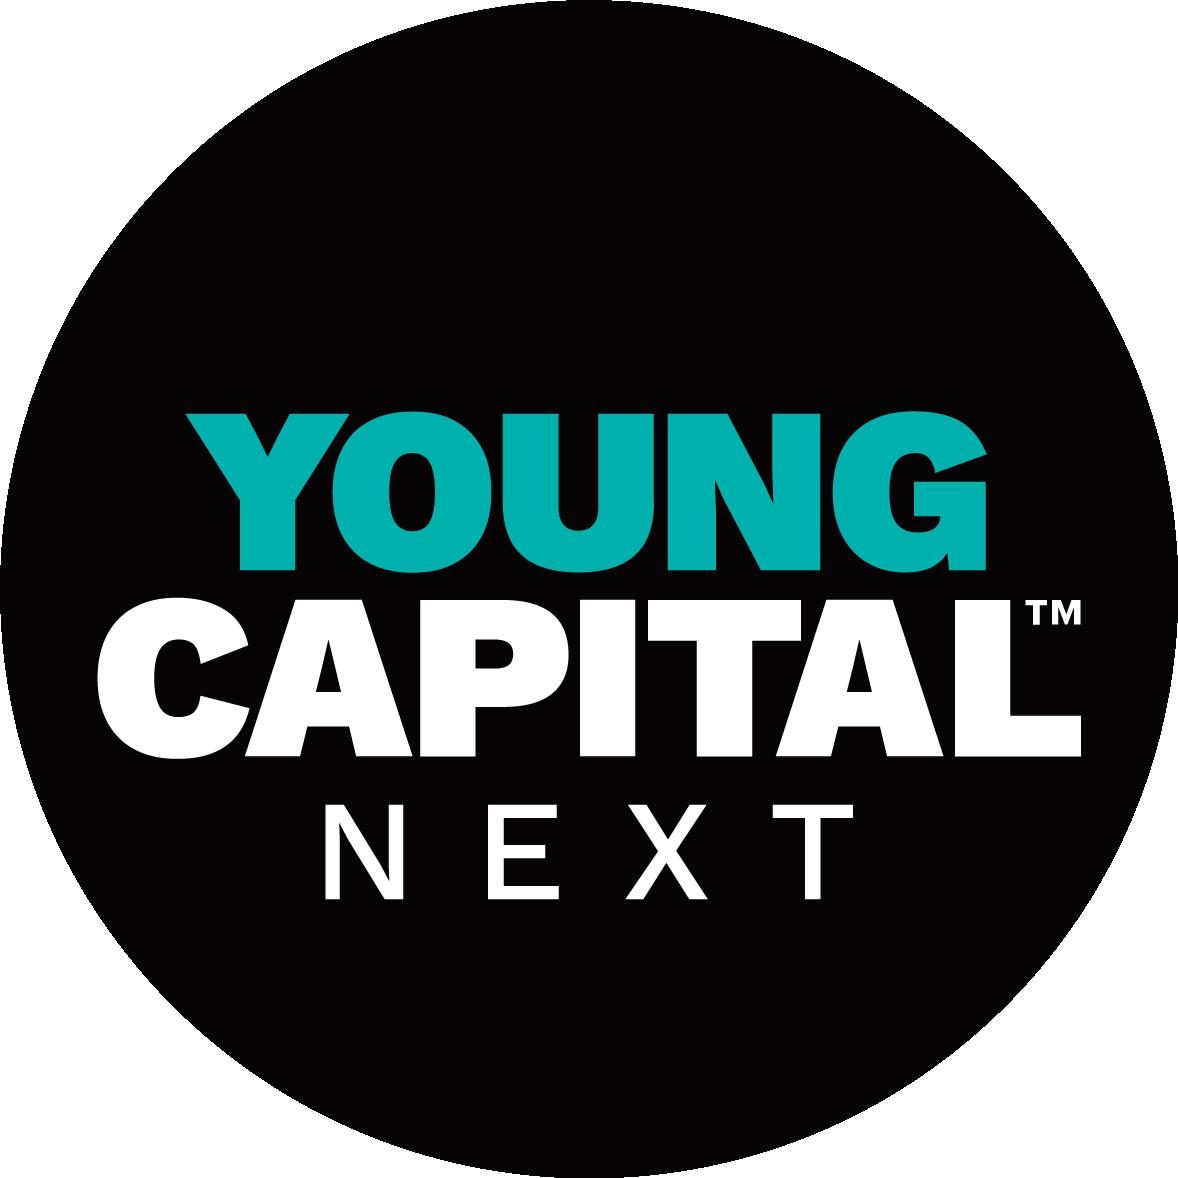 YoungCapital NEXT borrel